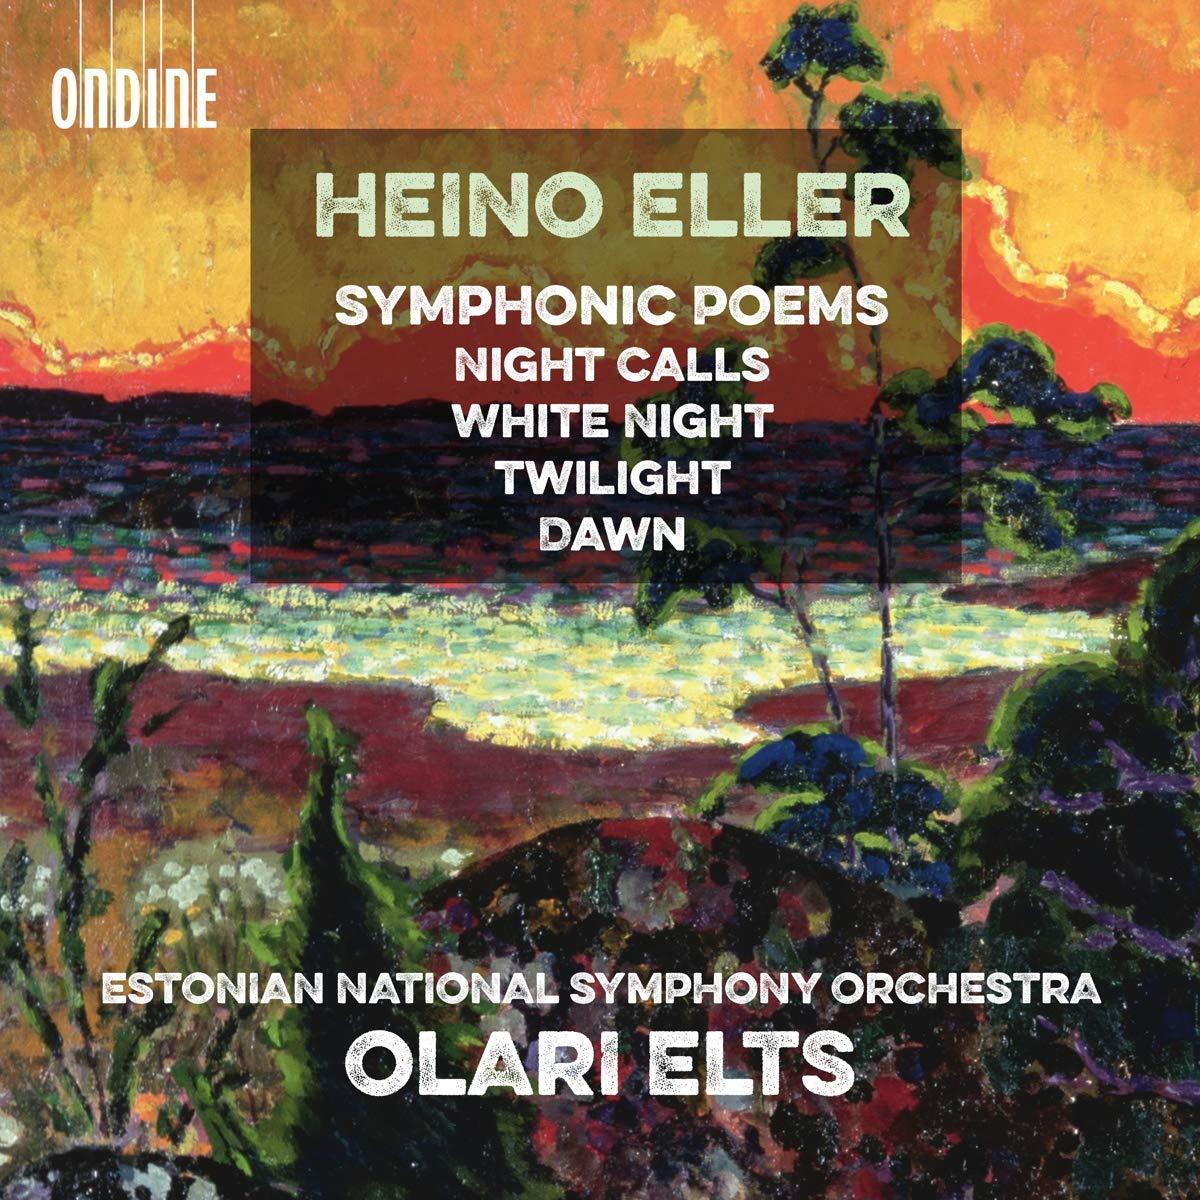 Estonian National Symphony Orchestra, Heino Eller, Olari Elts - Symphonic  Poems - Amazon.com Music